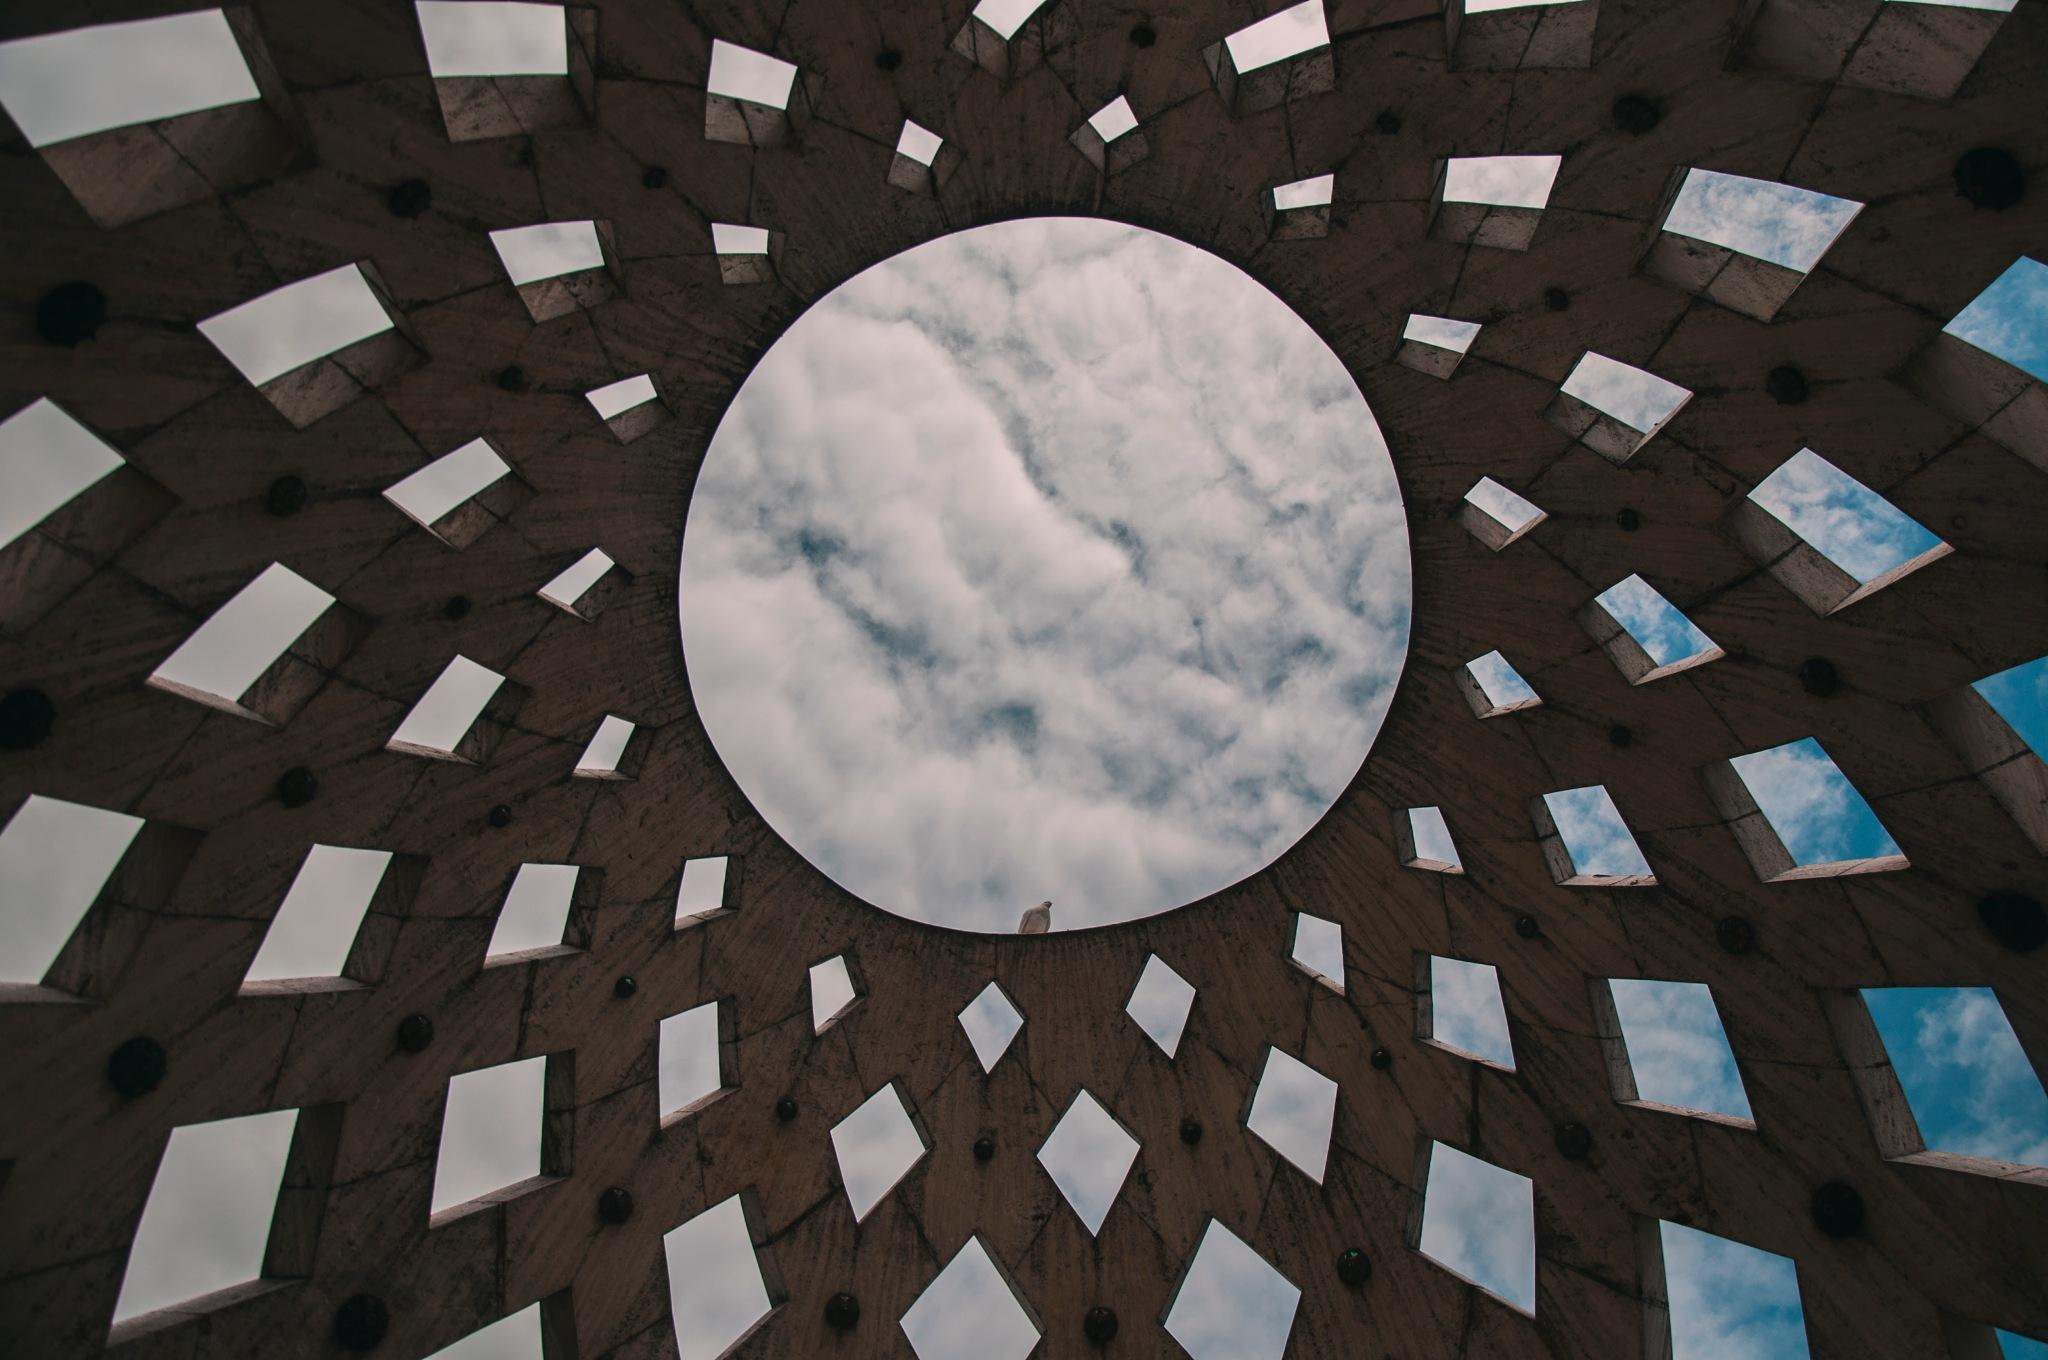 View on the sky by Oleksandr Albov